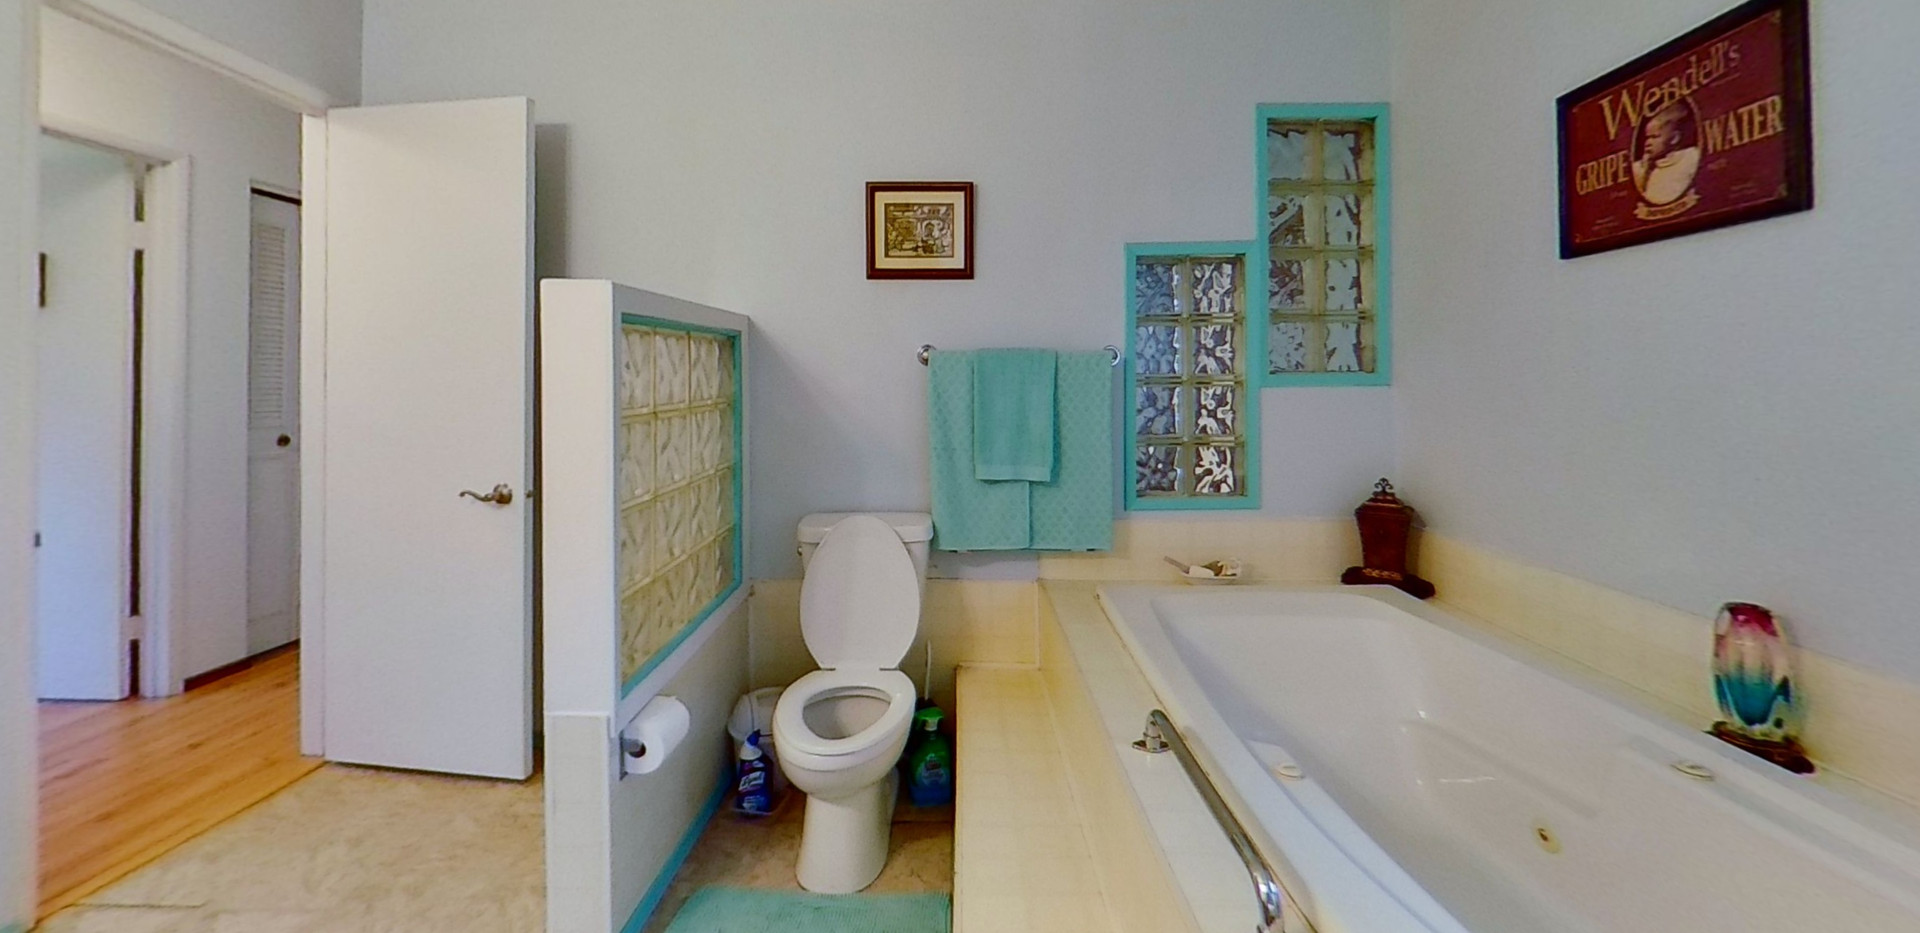 1300-Beachview-Cres-Bathroom.jpg